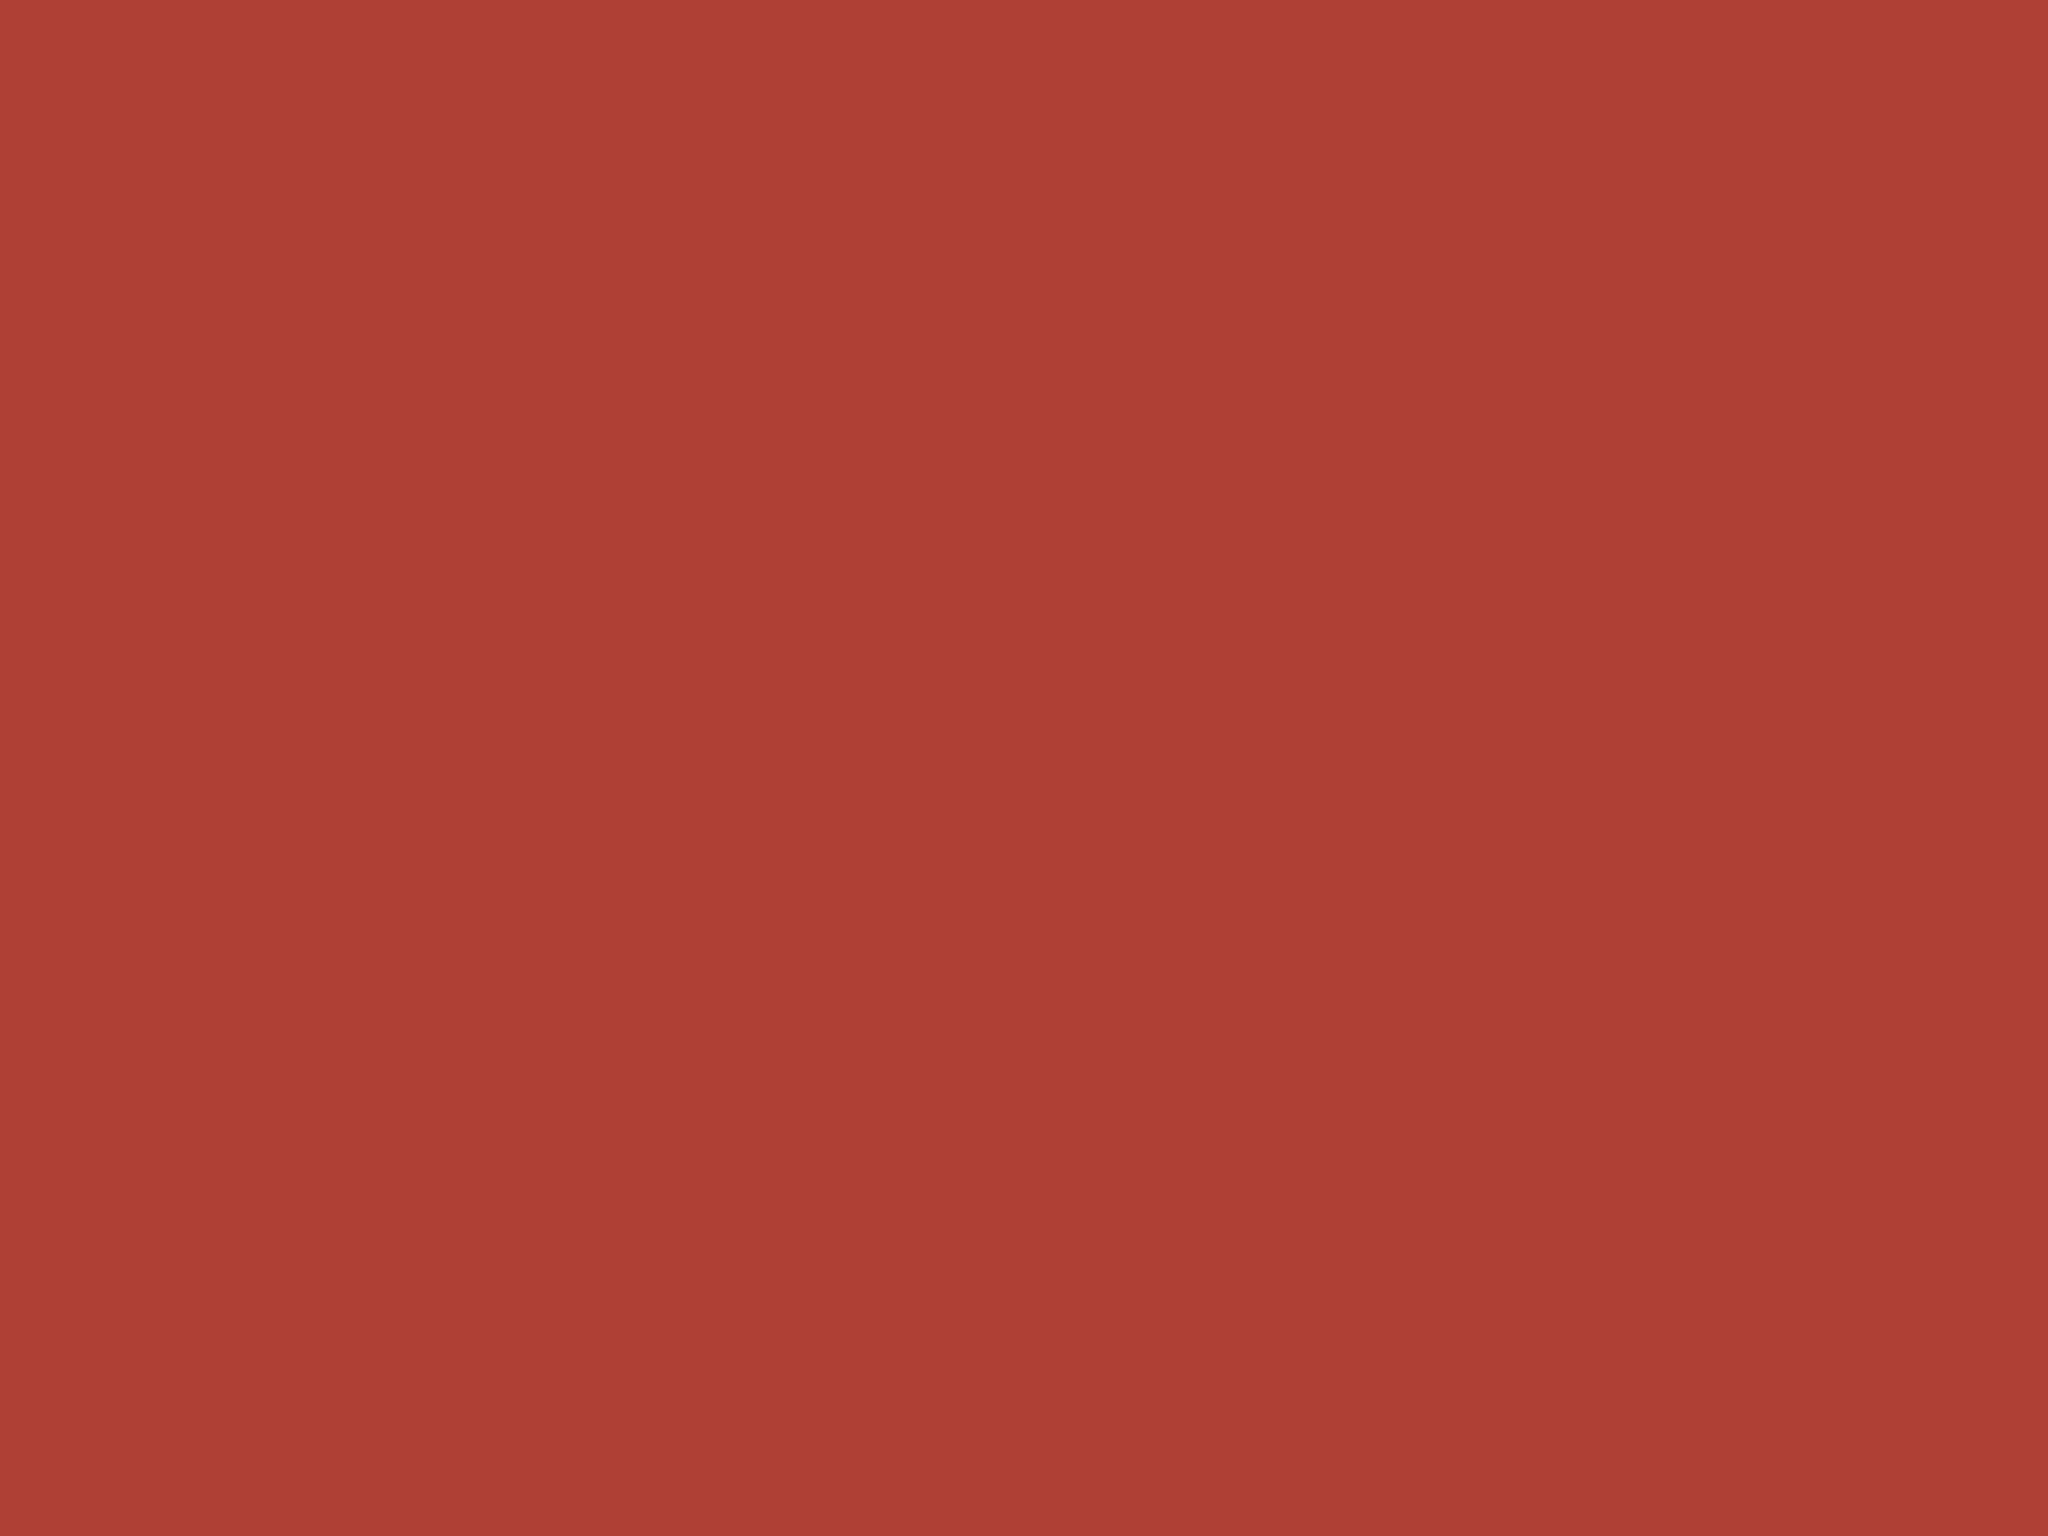 2048x1536 Pale Carmine Solid Color Background